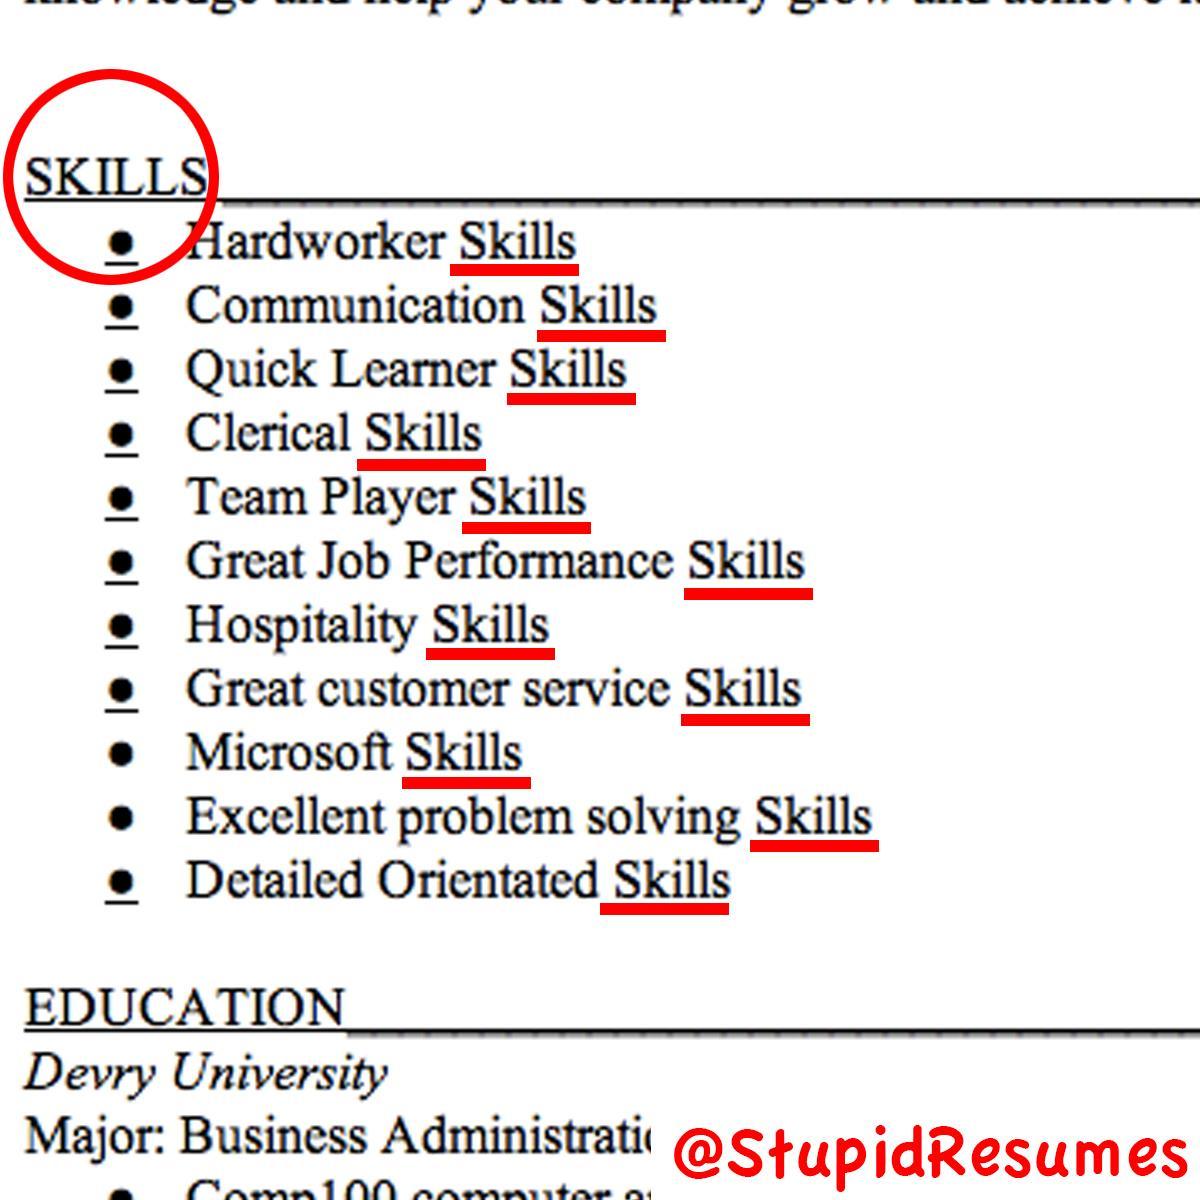 stupid resumes on we only hire people who have great stupid resumes on we only hire people who have great skills ya know like nunchuck skills bo hunting skills computer hacking skills